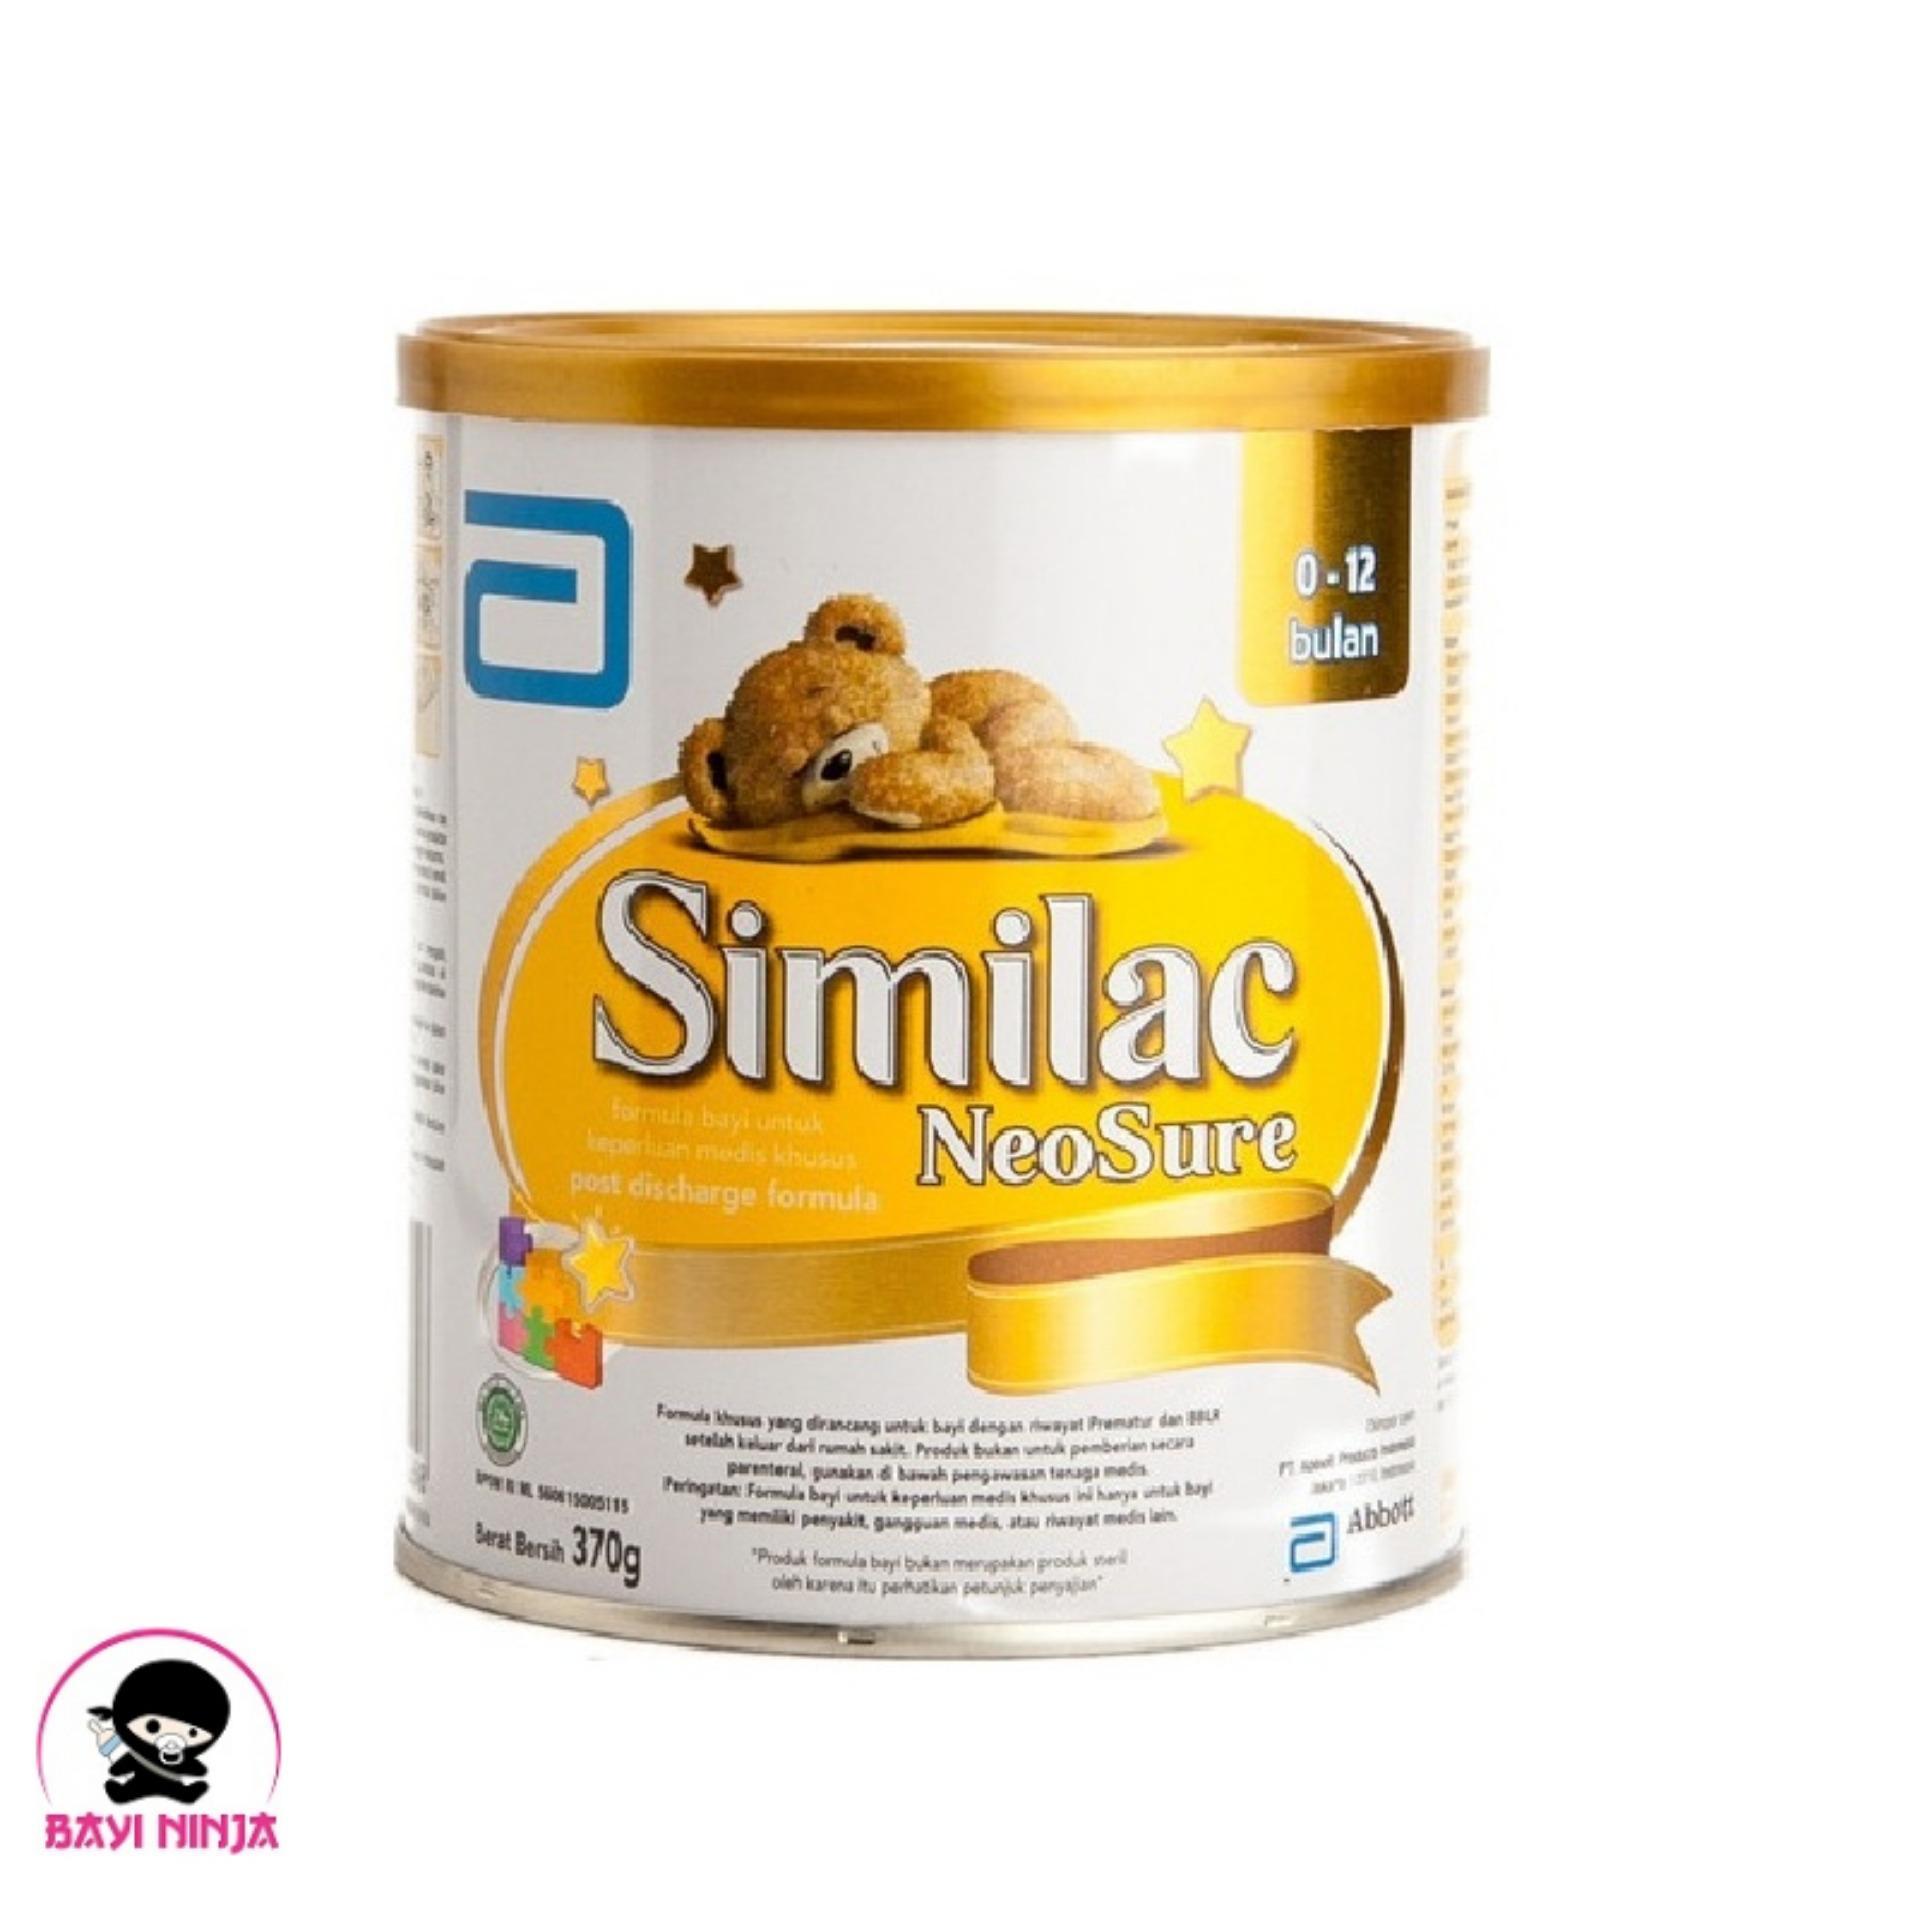 Jual Hot Deal Nestle Nutren Junior Susu Tin 800gr Promo Promo Source · SIMILAC Neosure 0 12 bulan 370g 370 g